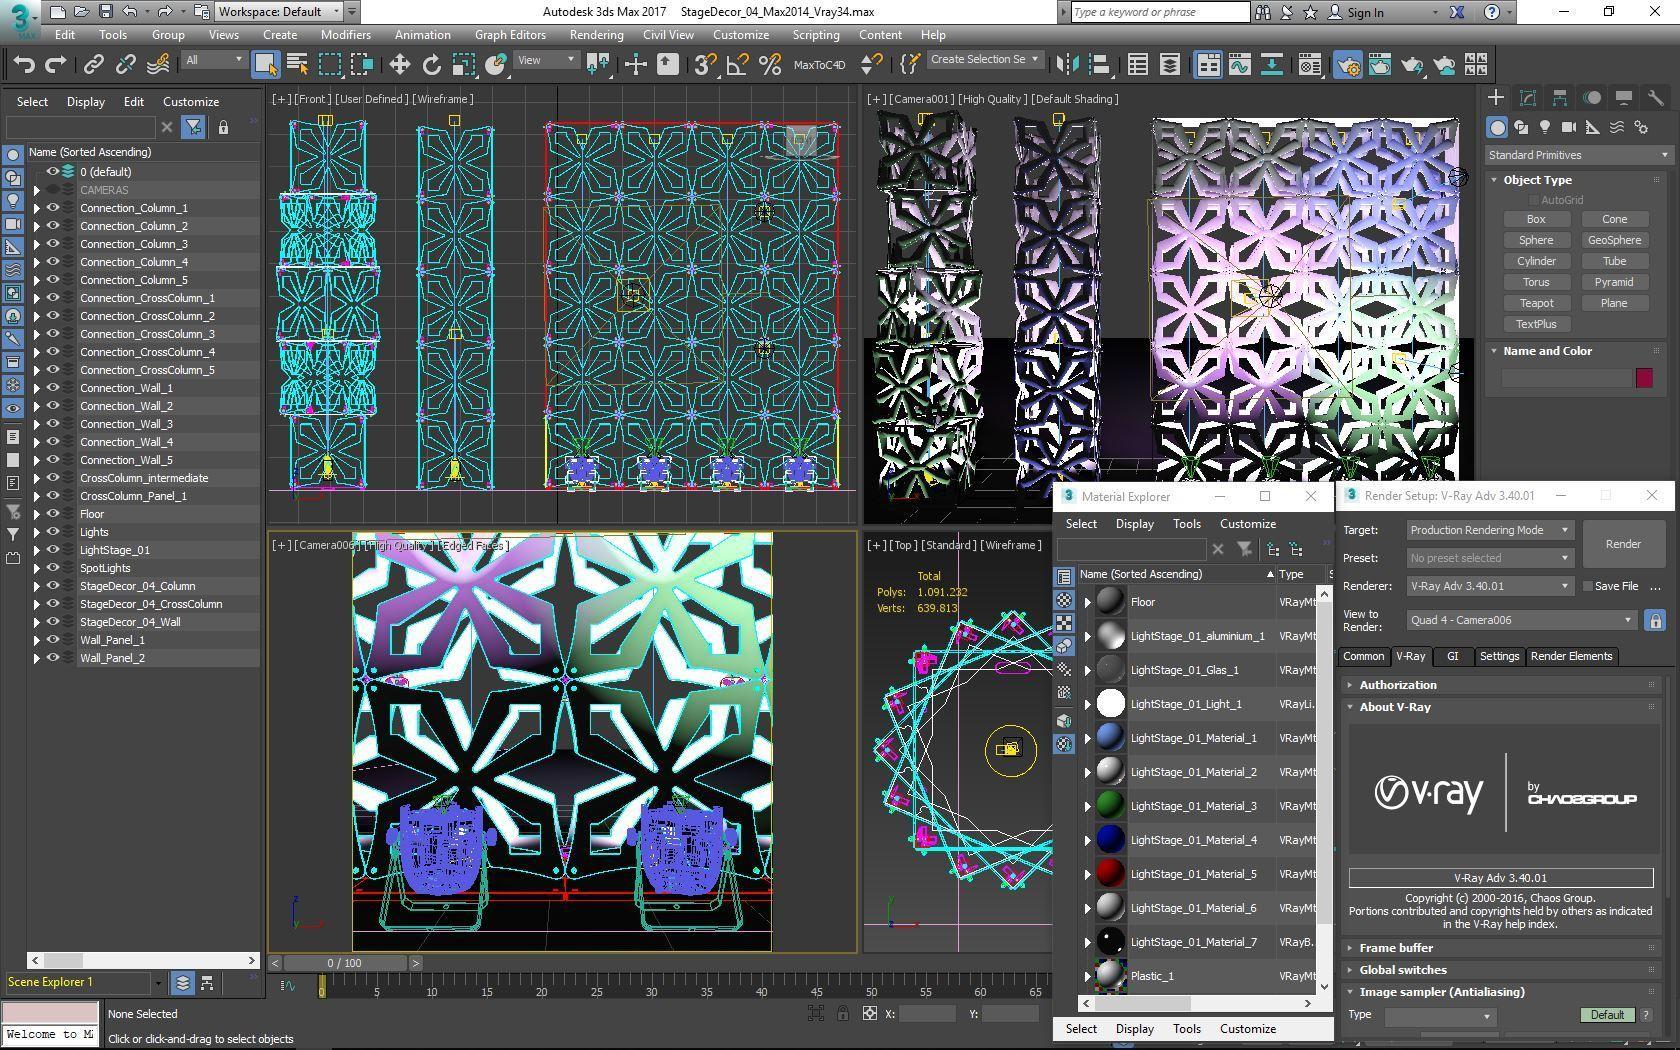 70-Max-04-01-1680.JPG Download STL file Stage Decor Collection 01 (Modular 9 Pieces) • 3D printer model, akerStudio